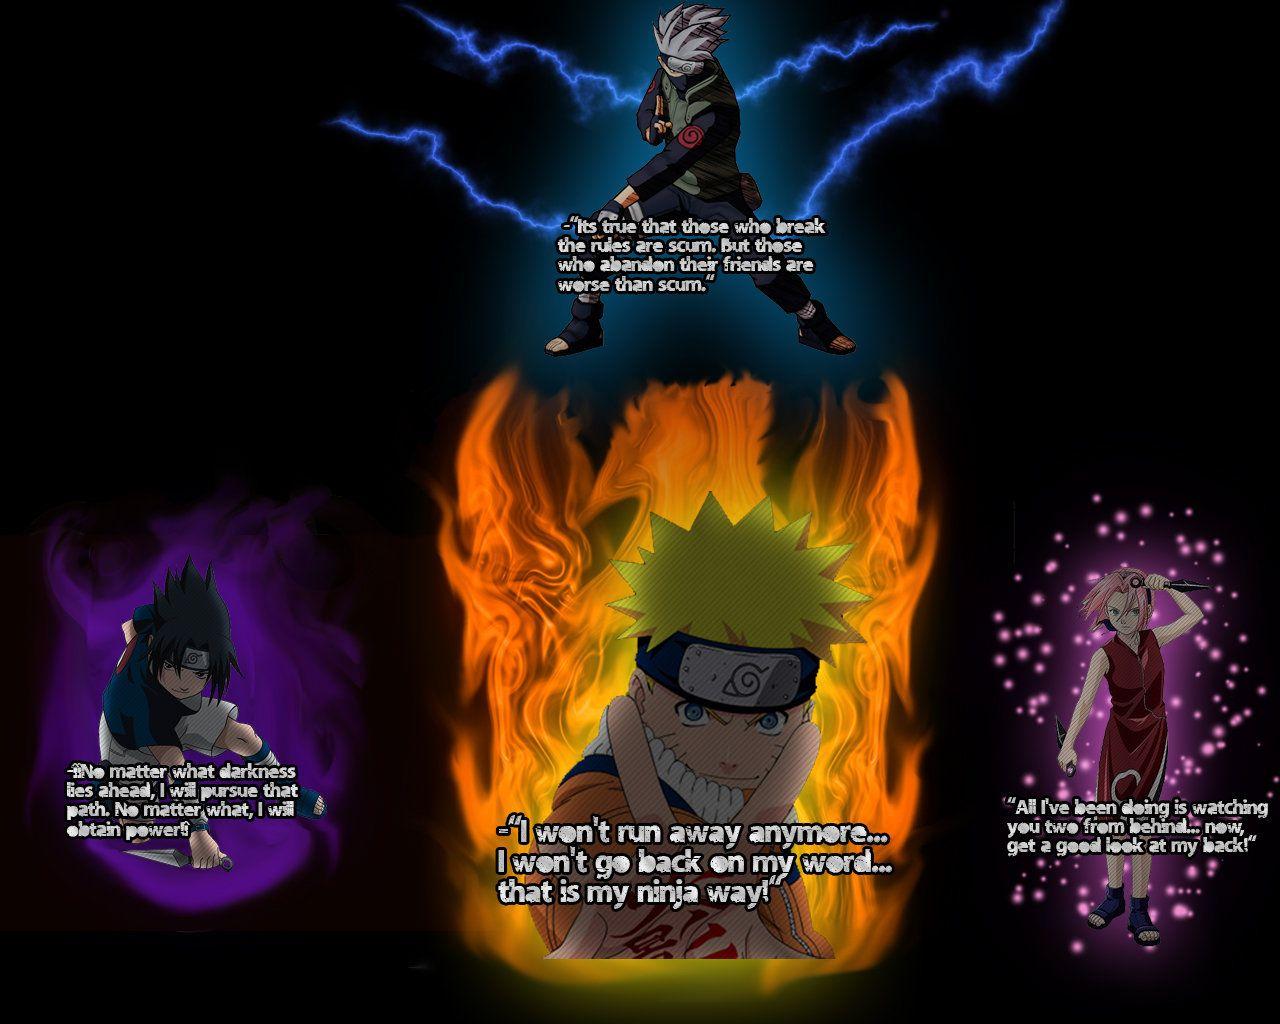 Naruto Quotes Wallpaper